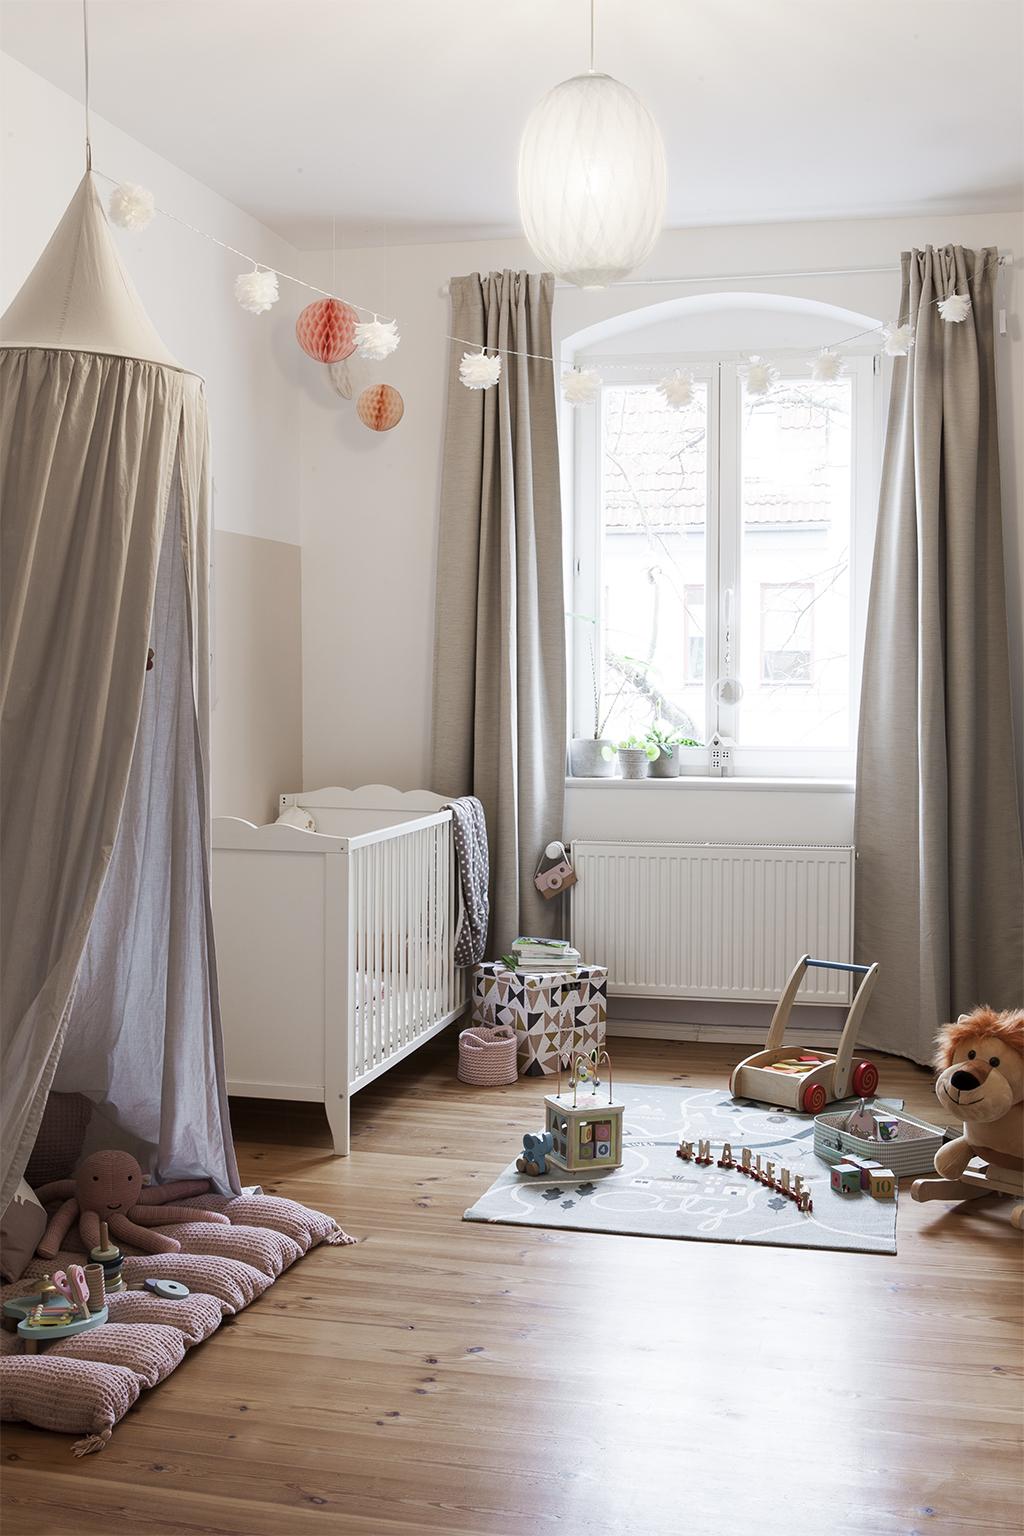 Kinderzimmer 2.0